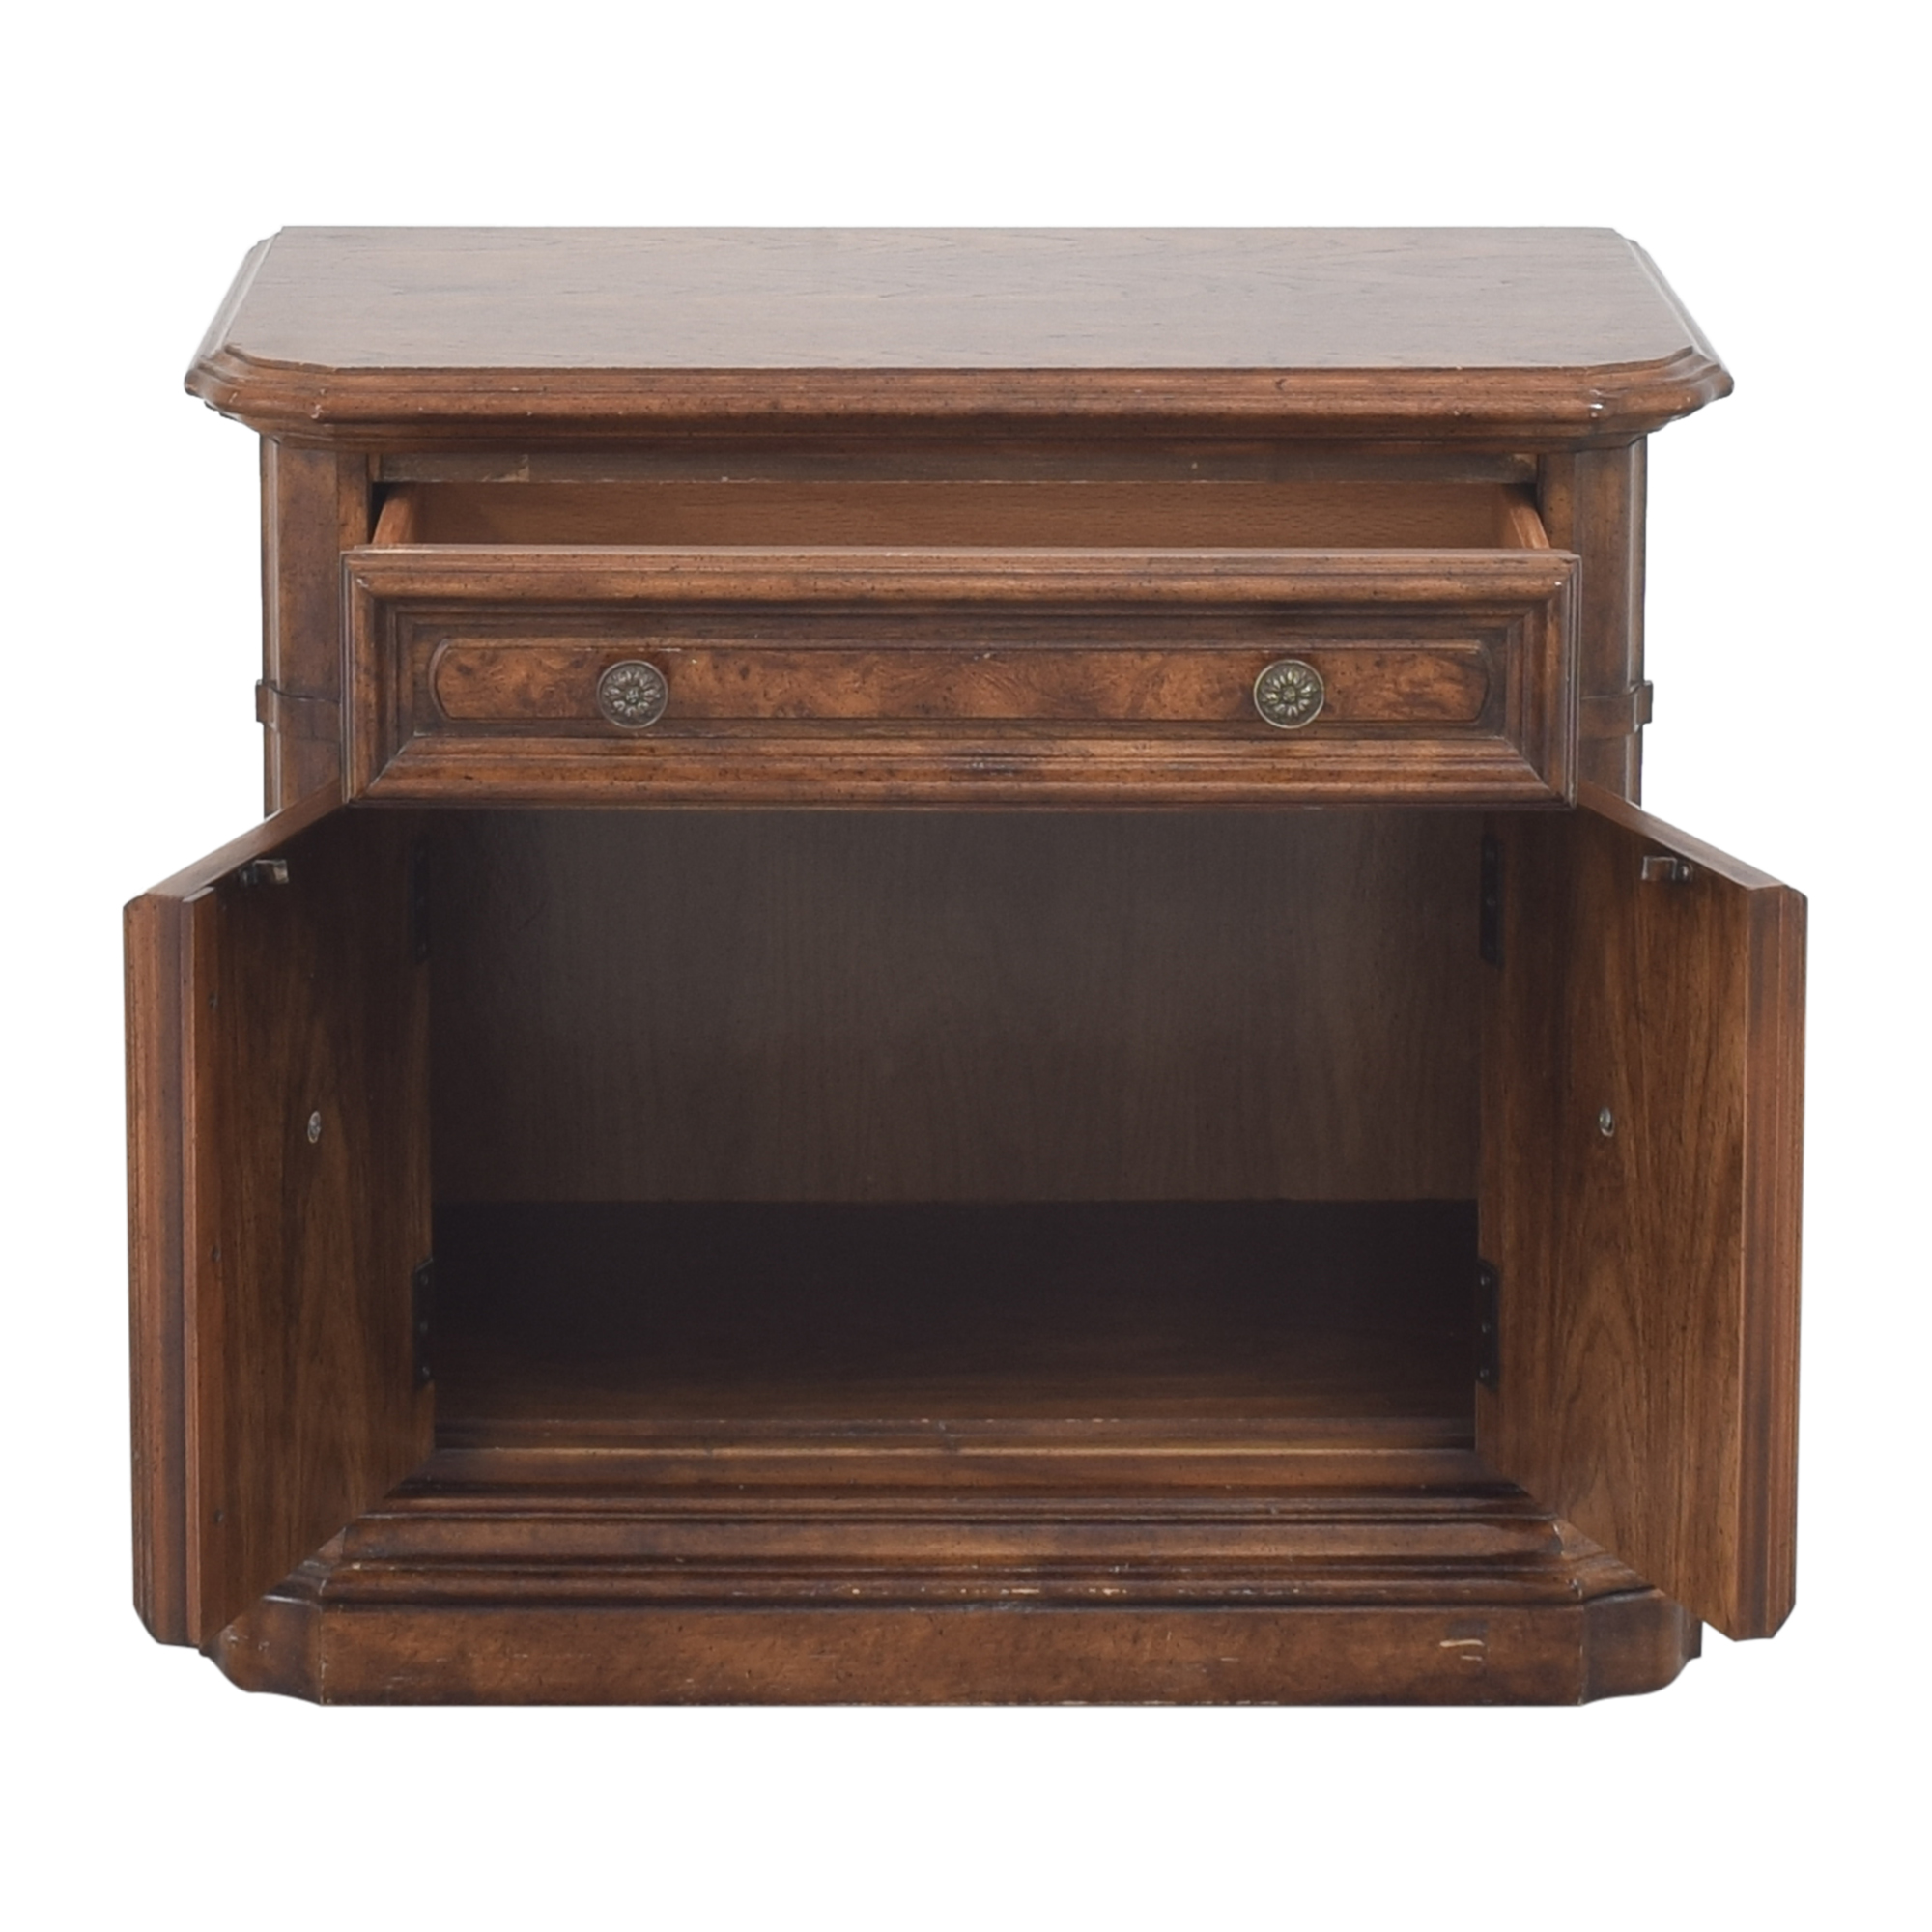 Stanley Furniture Stanley Furniture Cabinet Nightstand nj